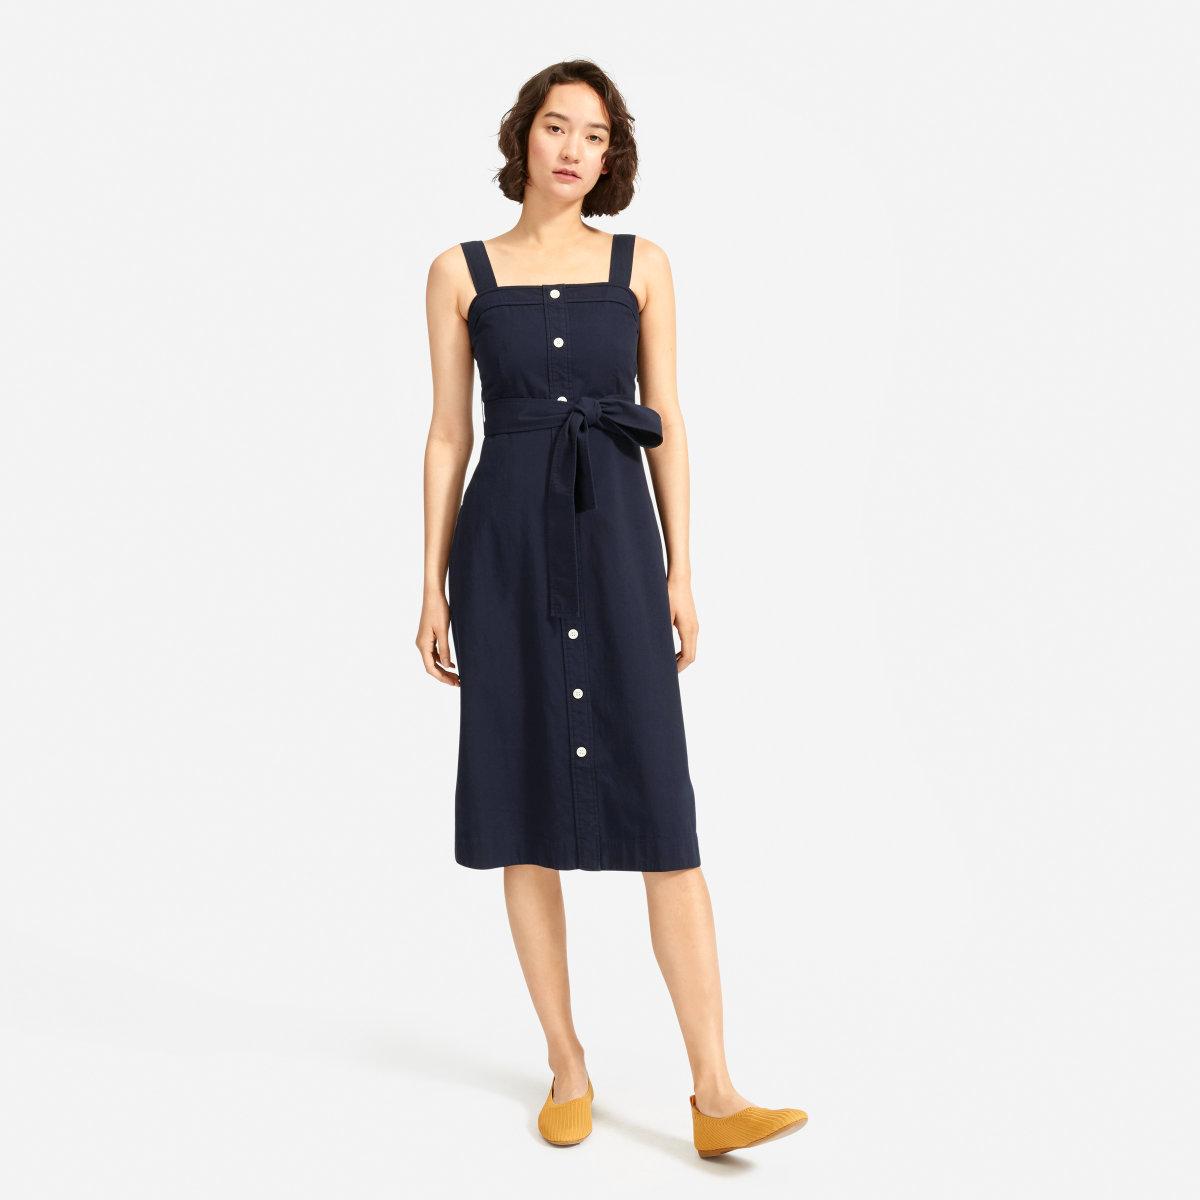 406b759e70 Women's Cotton Weave Picnic Dress | Everlane